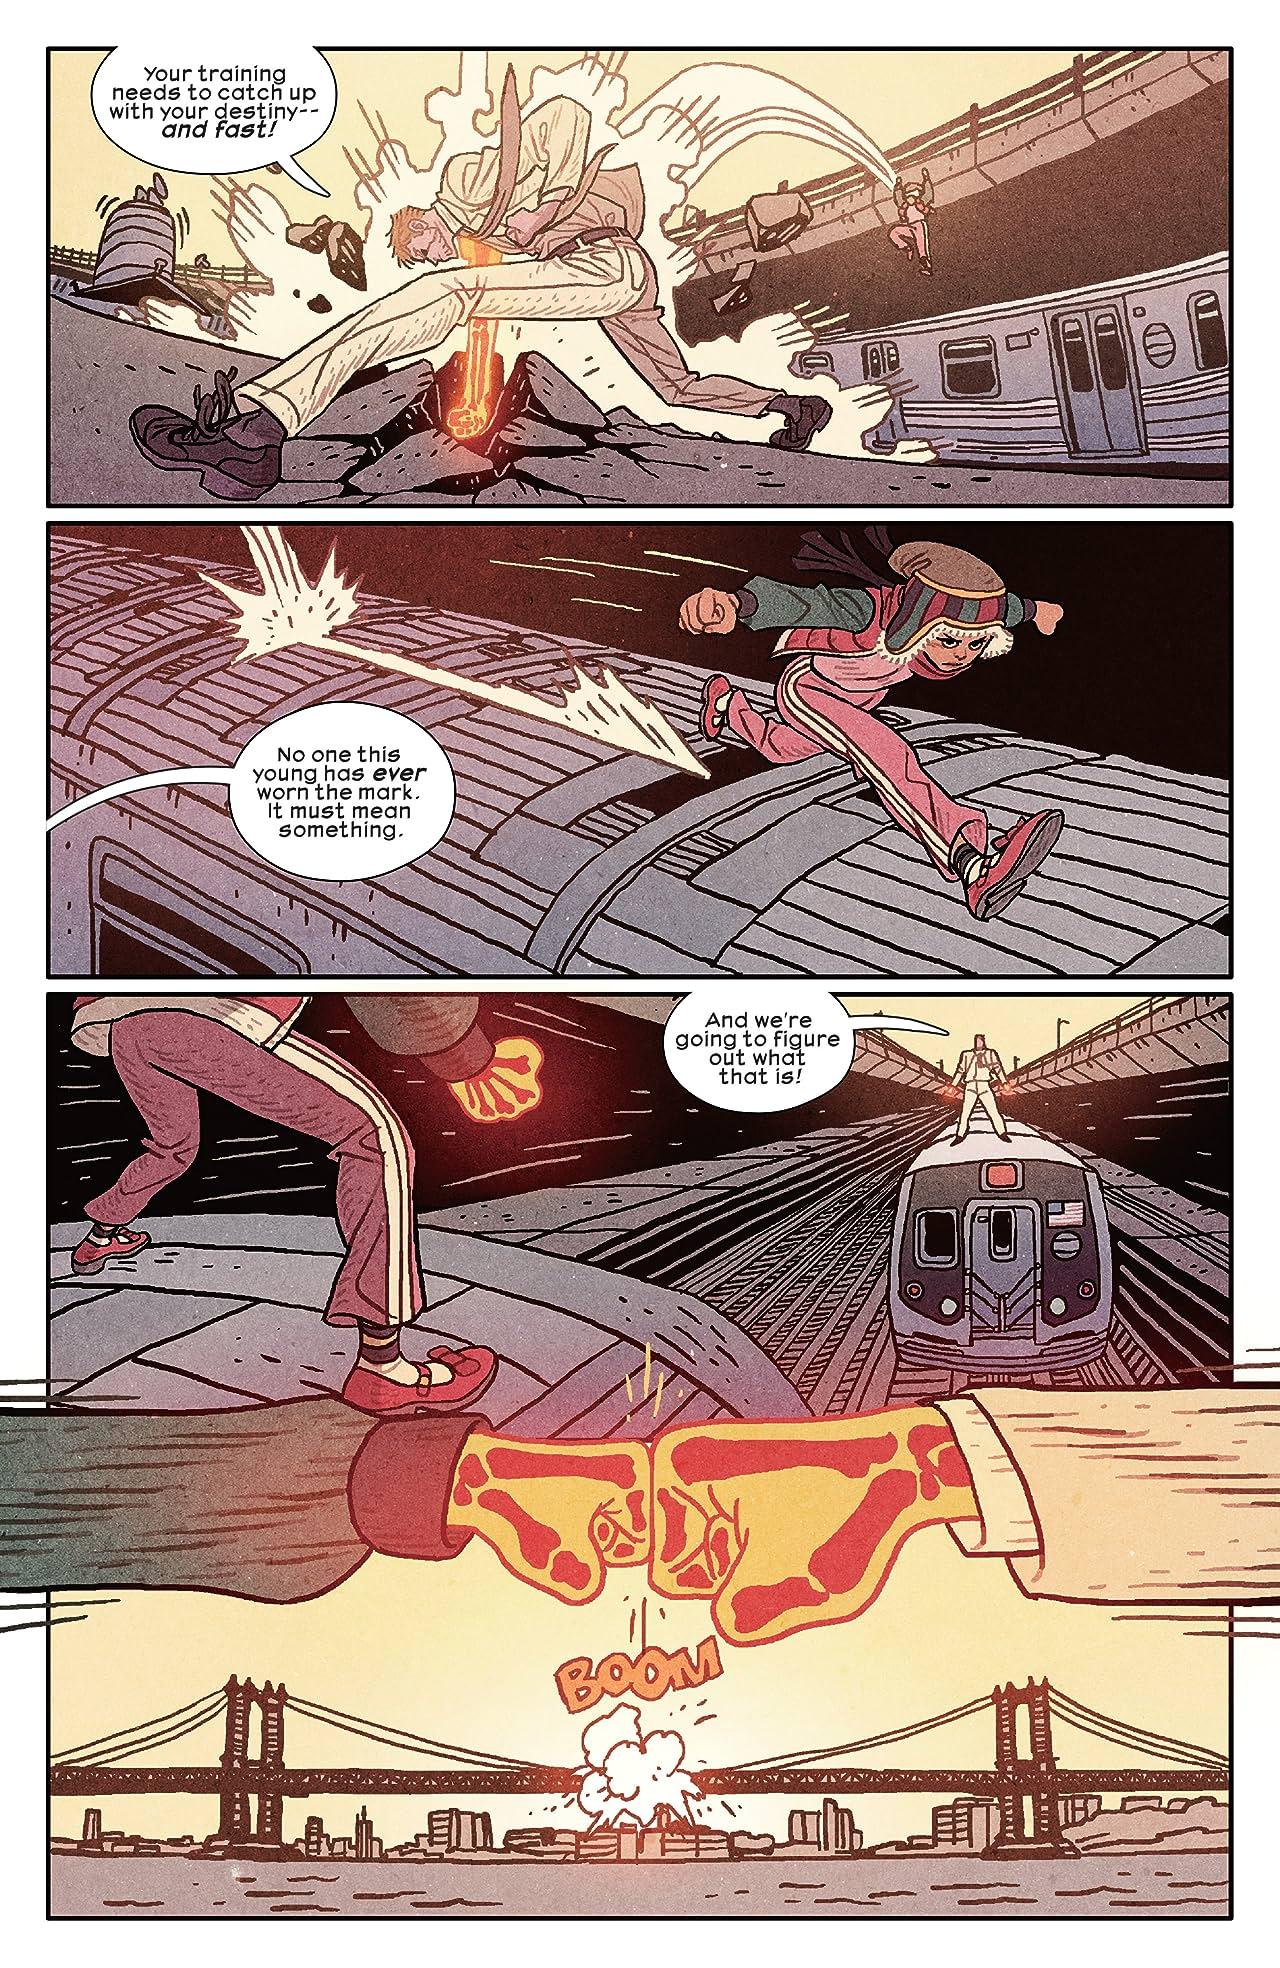 Immortal Iron Fists (2017) #1 (of 6)